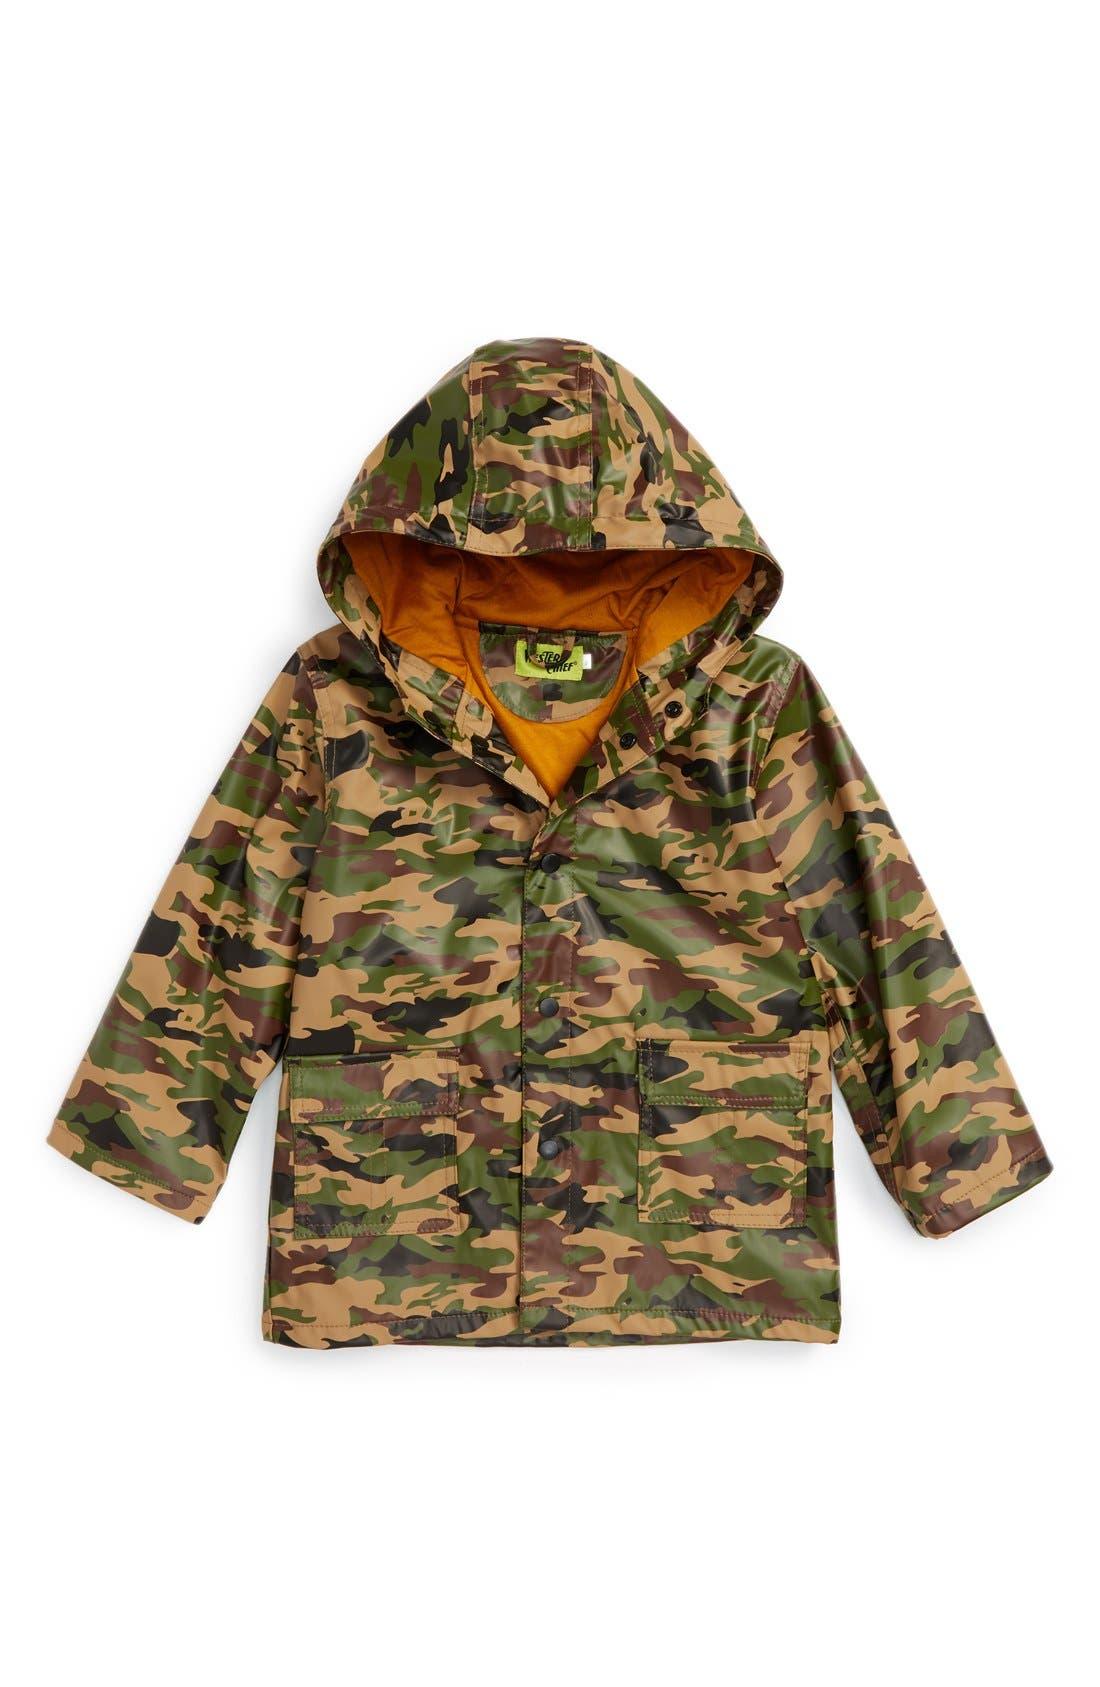 Main Image - Western Chief Camo Print Hooded Raincoat (Toddler Boys & Little Boys)